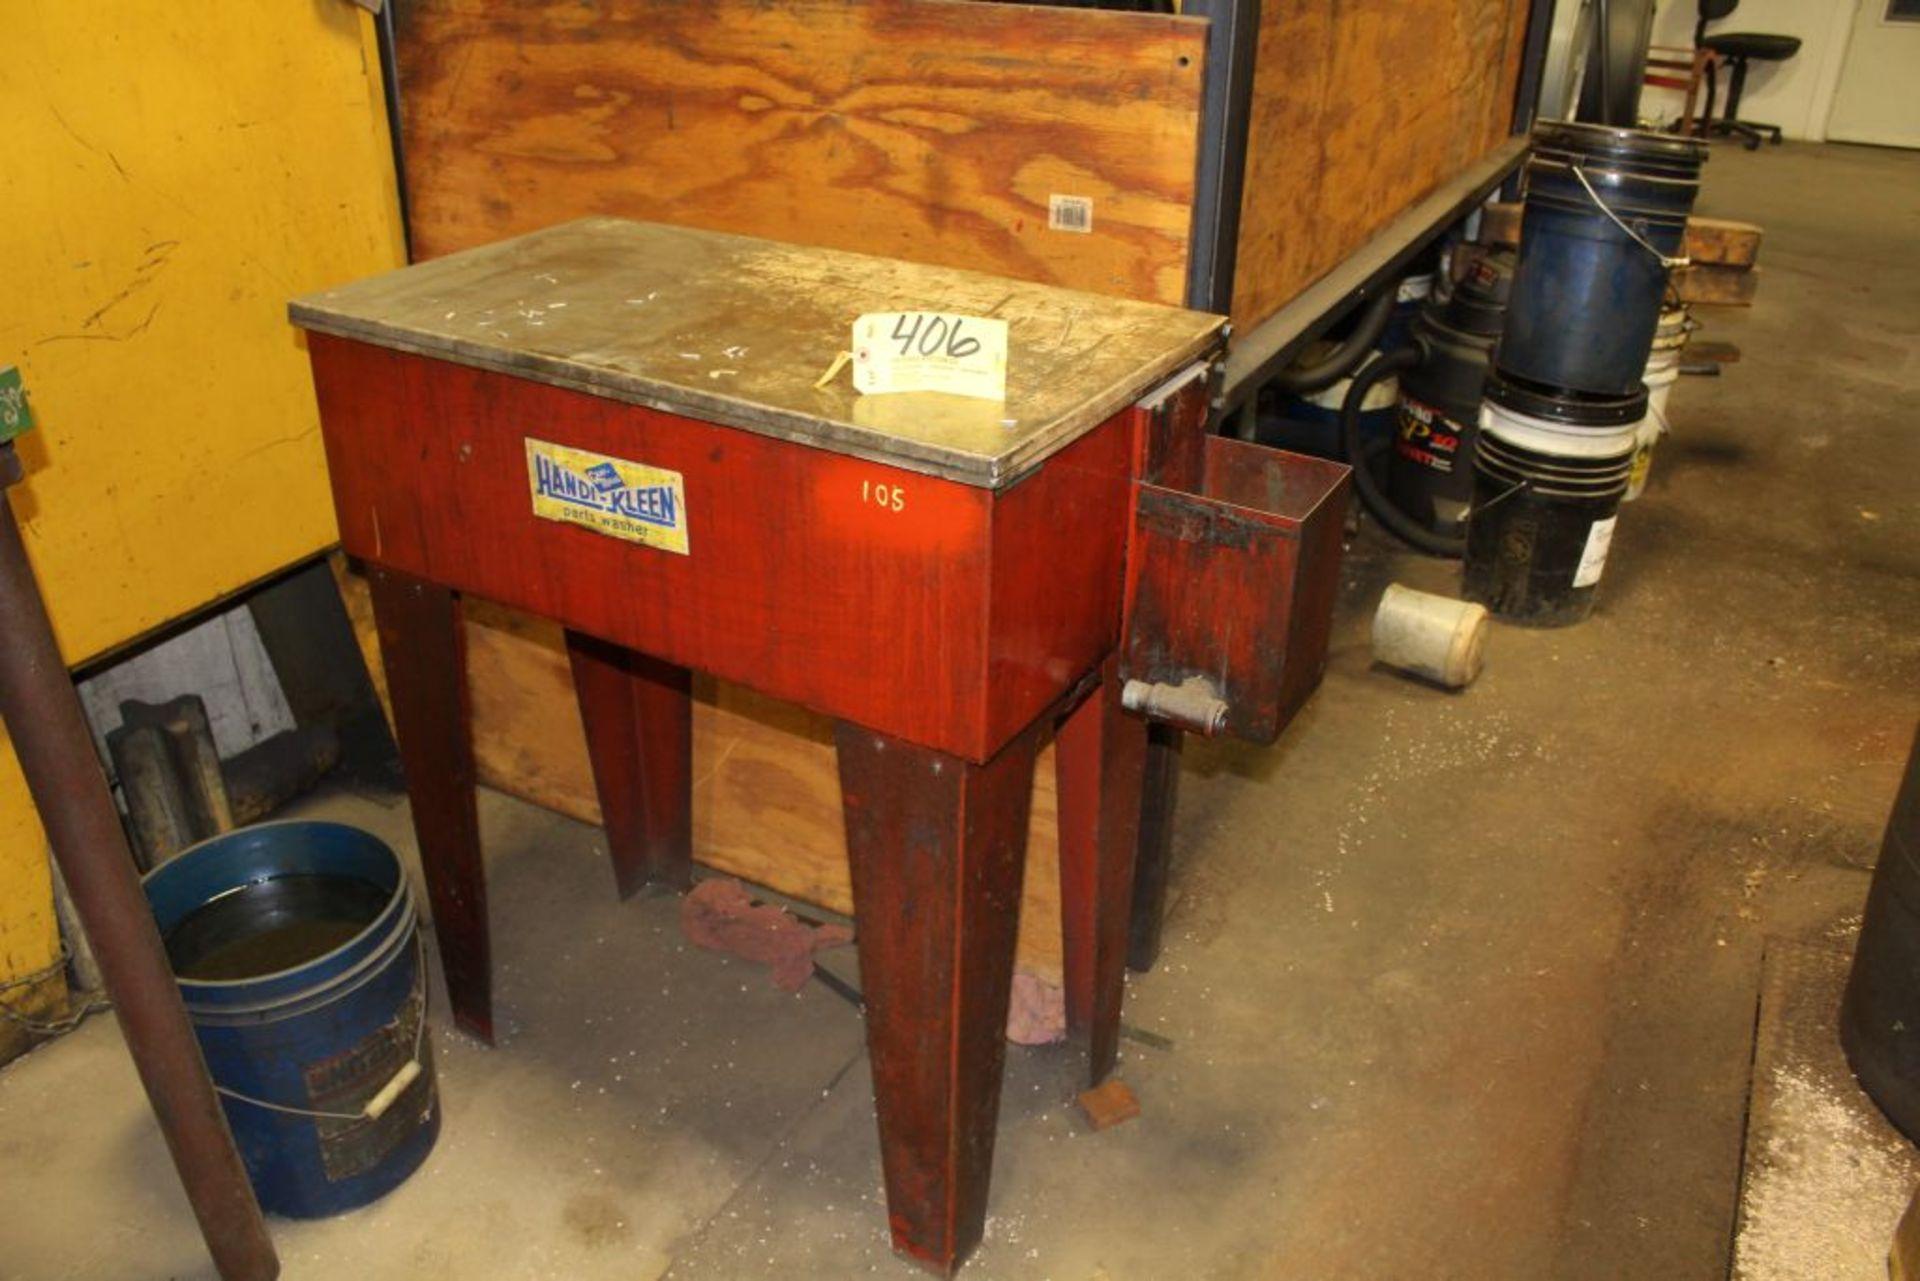 Lot 406 - Handi-Kleen parts washer.